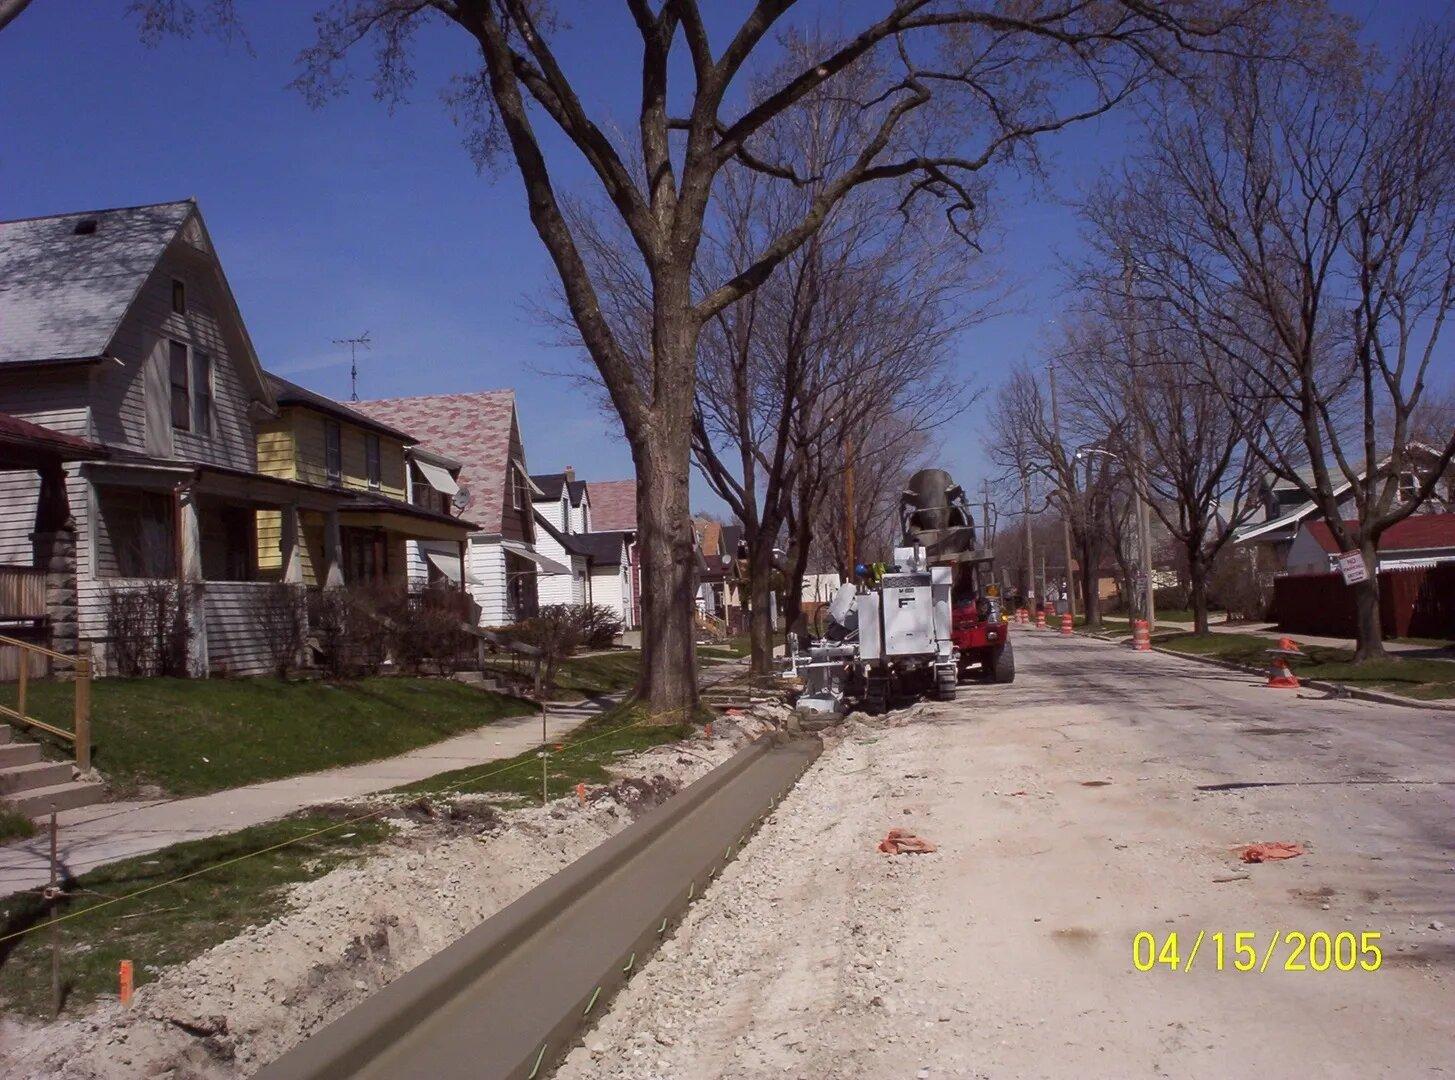 ARROW-CRETE CONSTRUCTION LLC